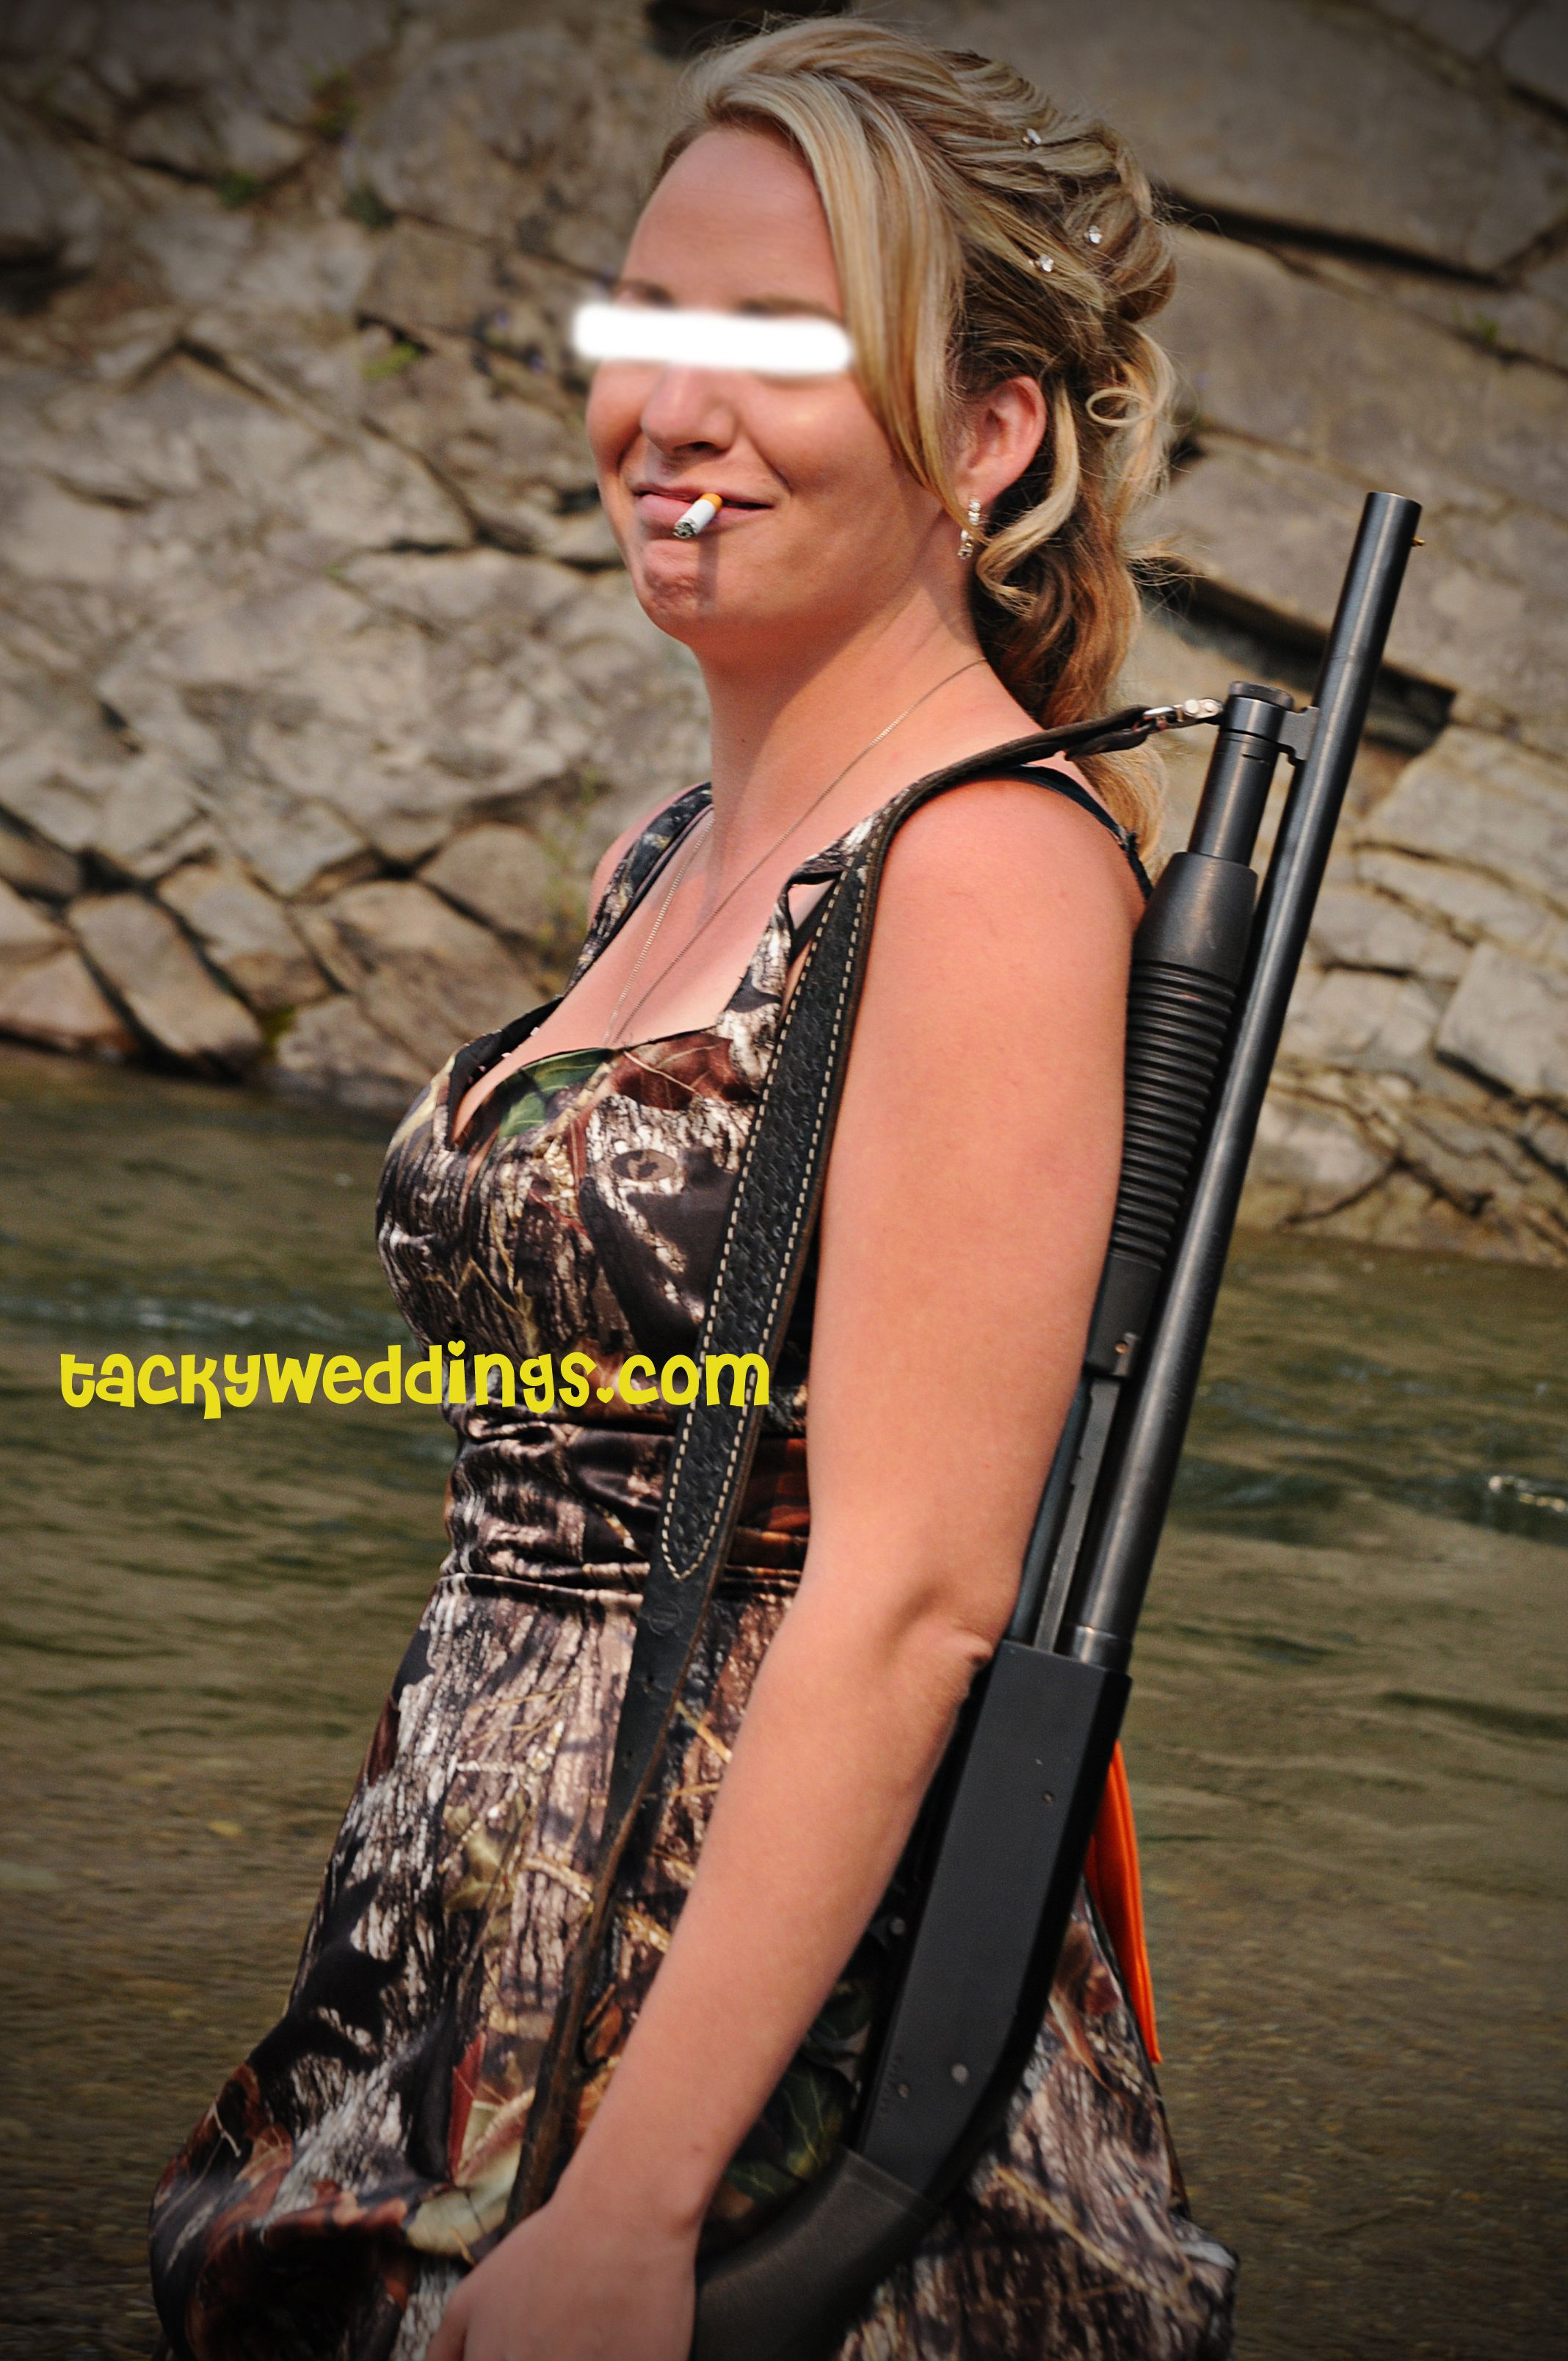 This Is Her Camo Wedding Dress Classy: Camo Wedding Dresses Worst At Websimilar.org